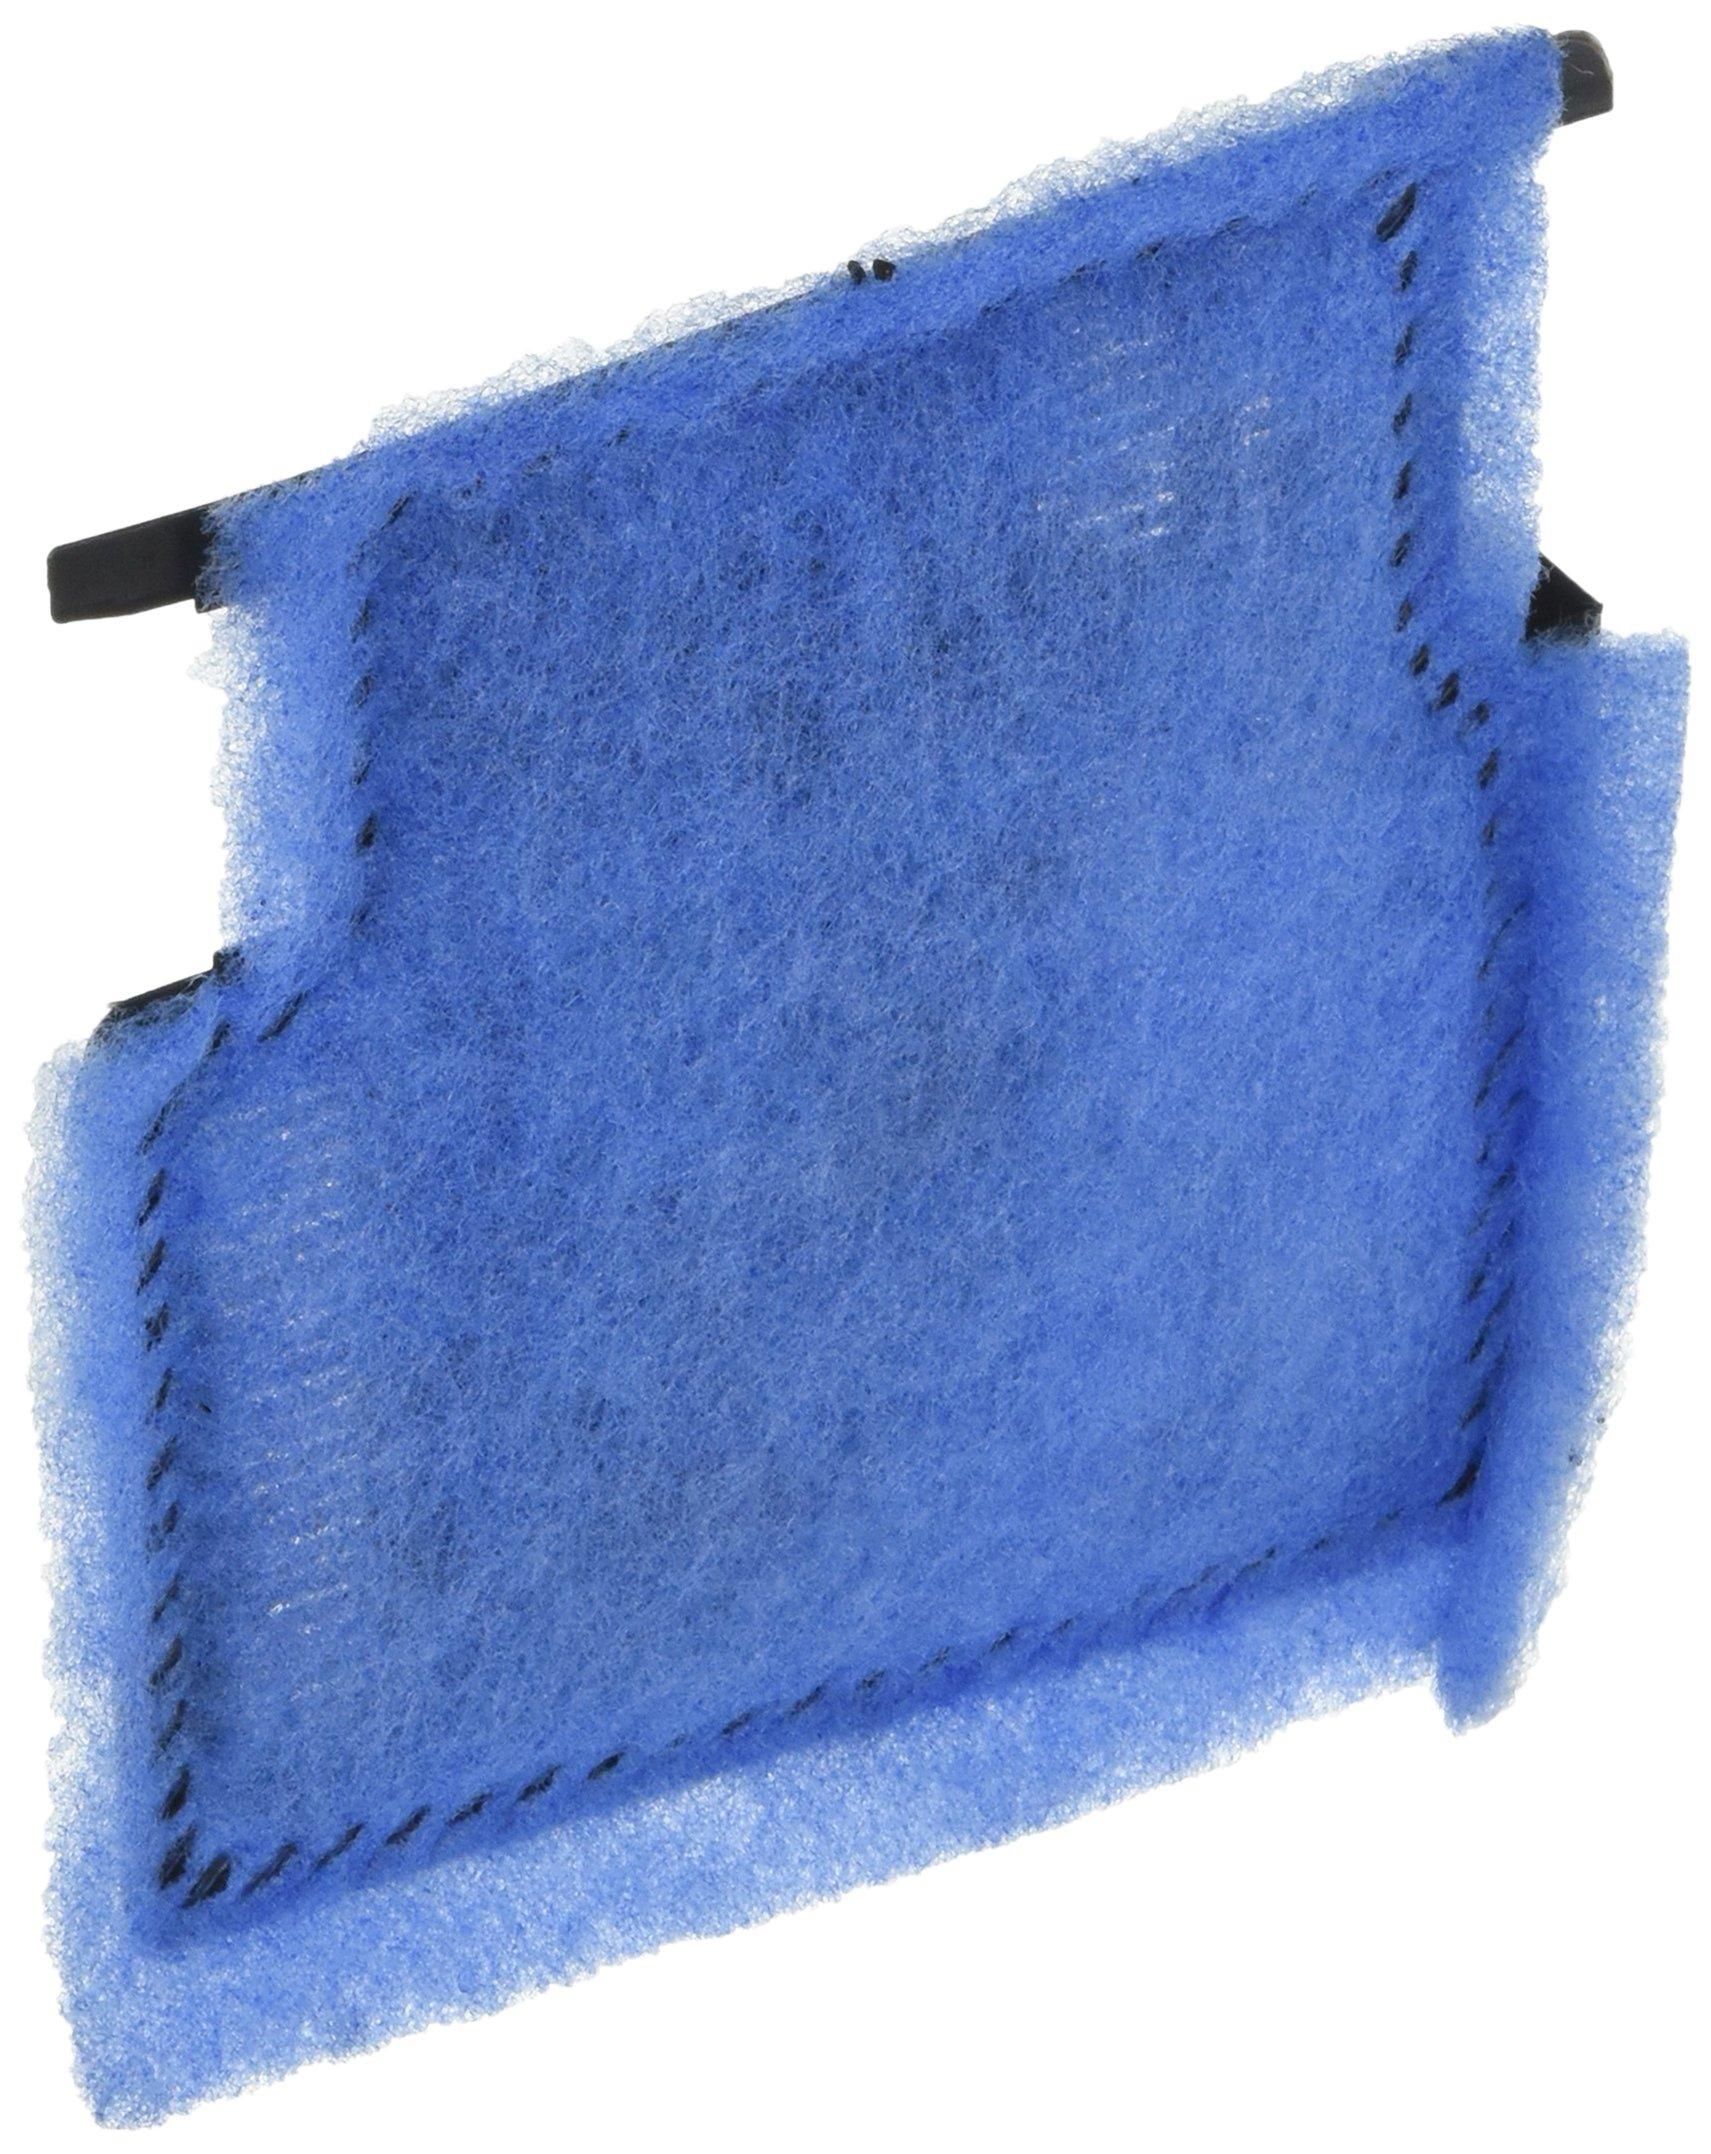 MarineLand Rite Filter Cartridge Size A Size: 3 Pack